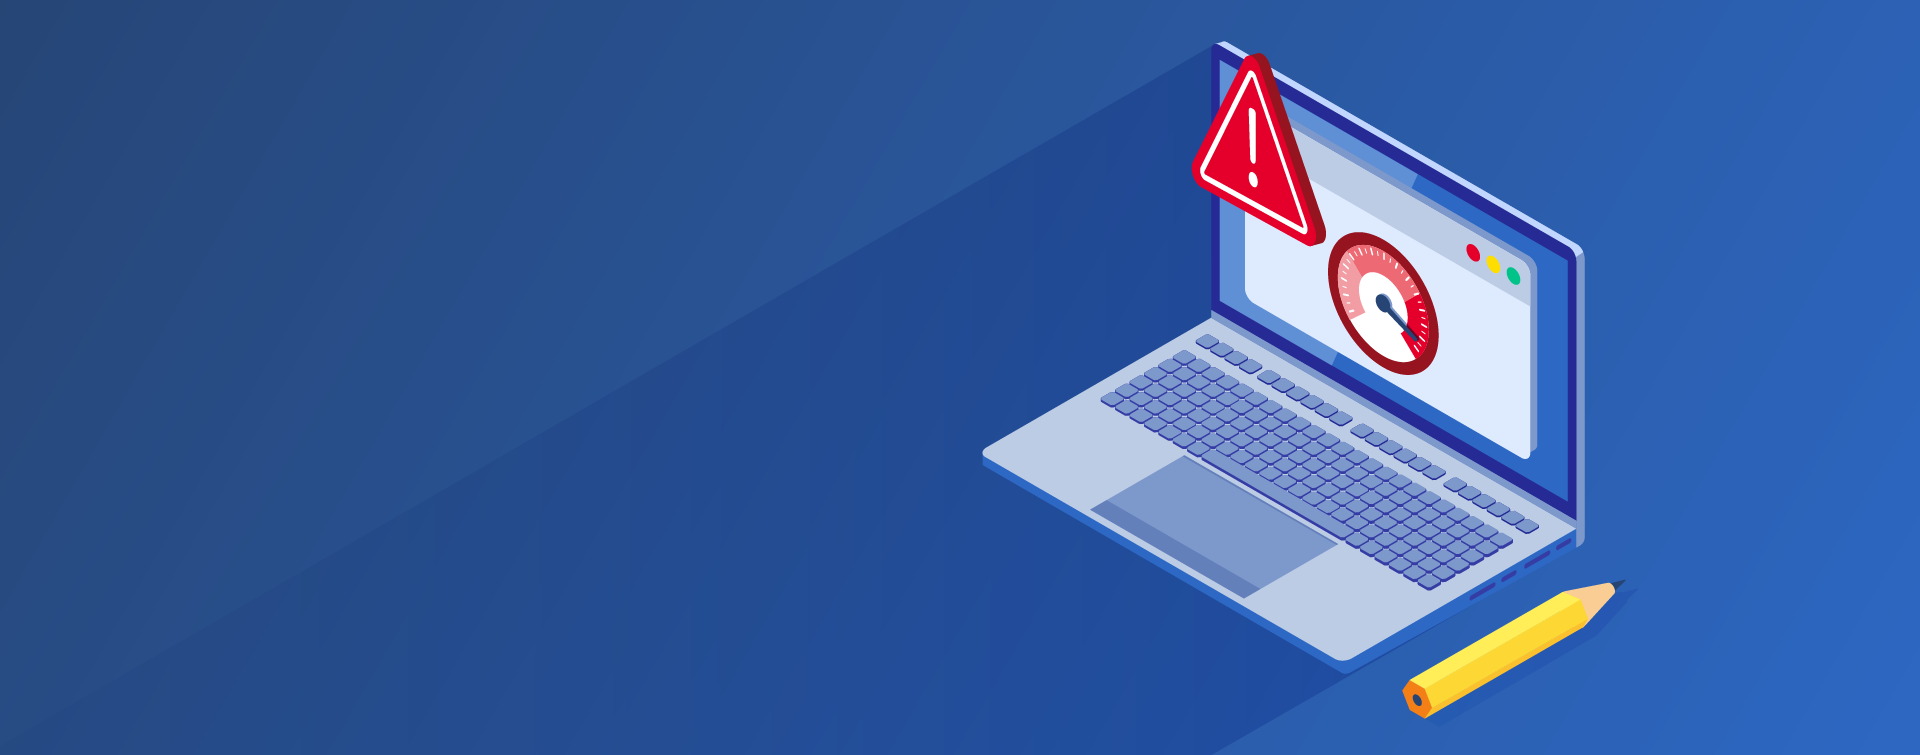 how dangerous is malware